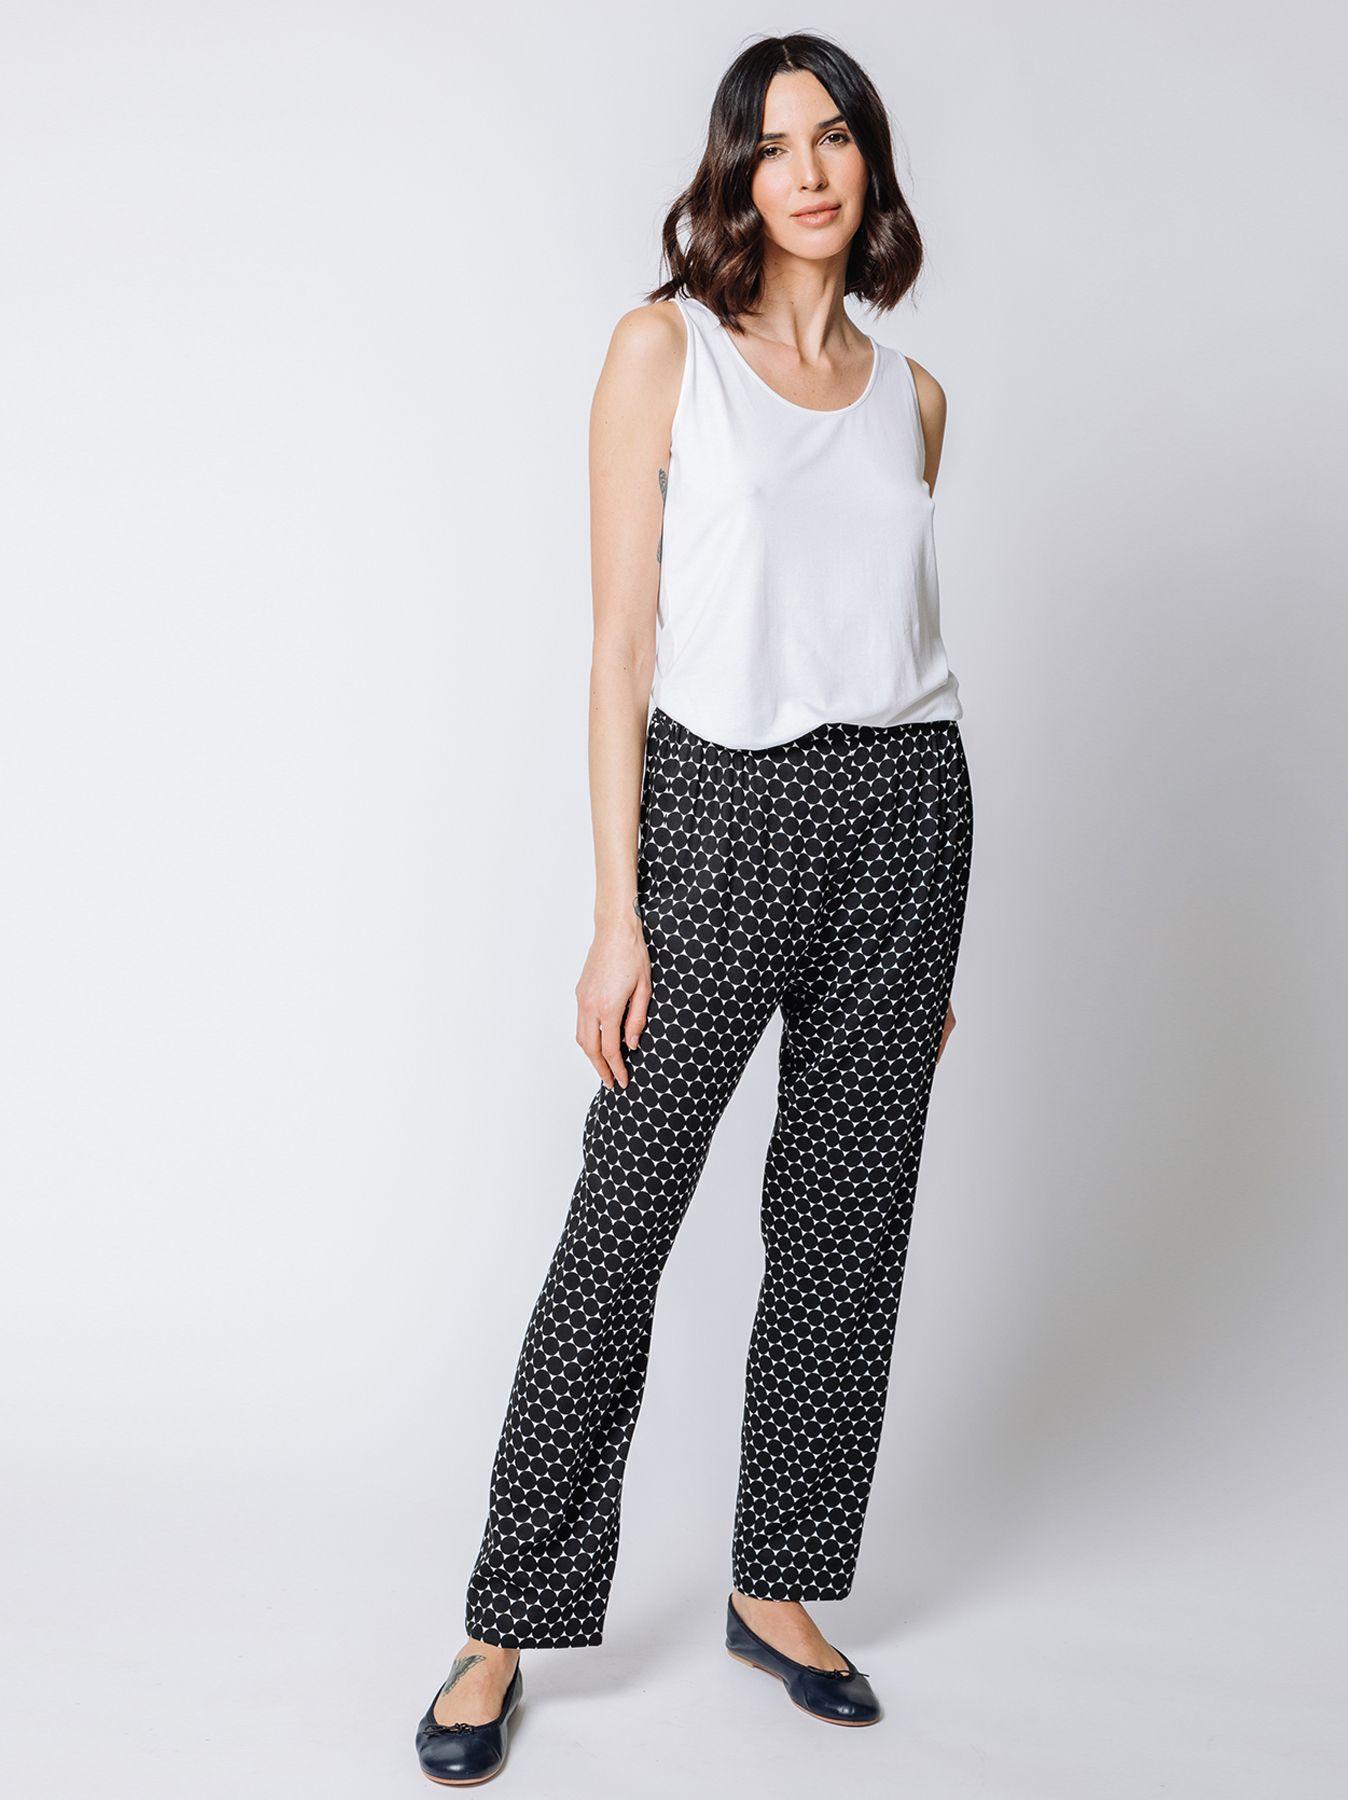 Pantalone con stampa OPTICAL